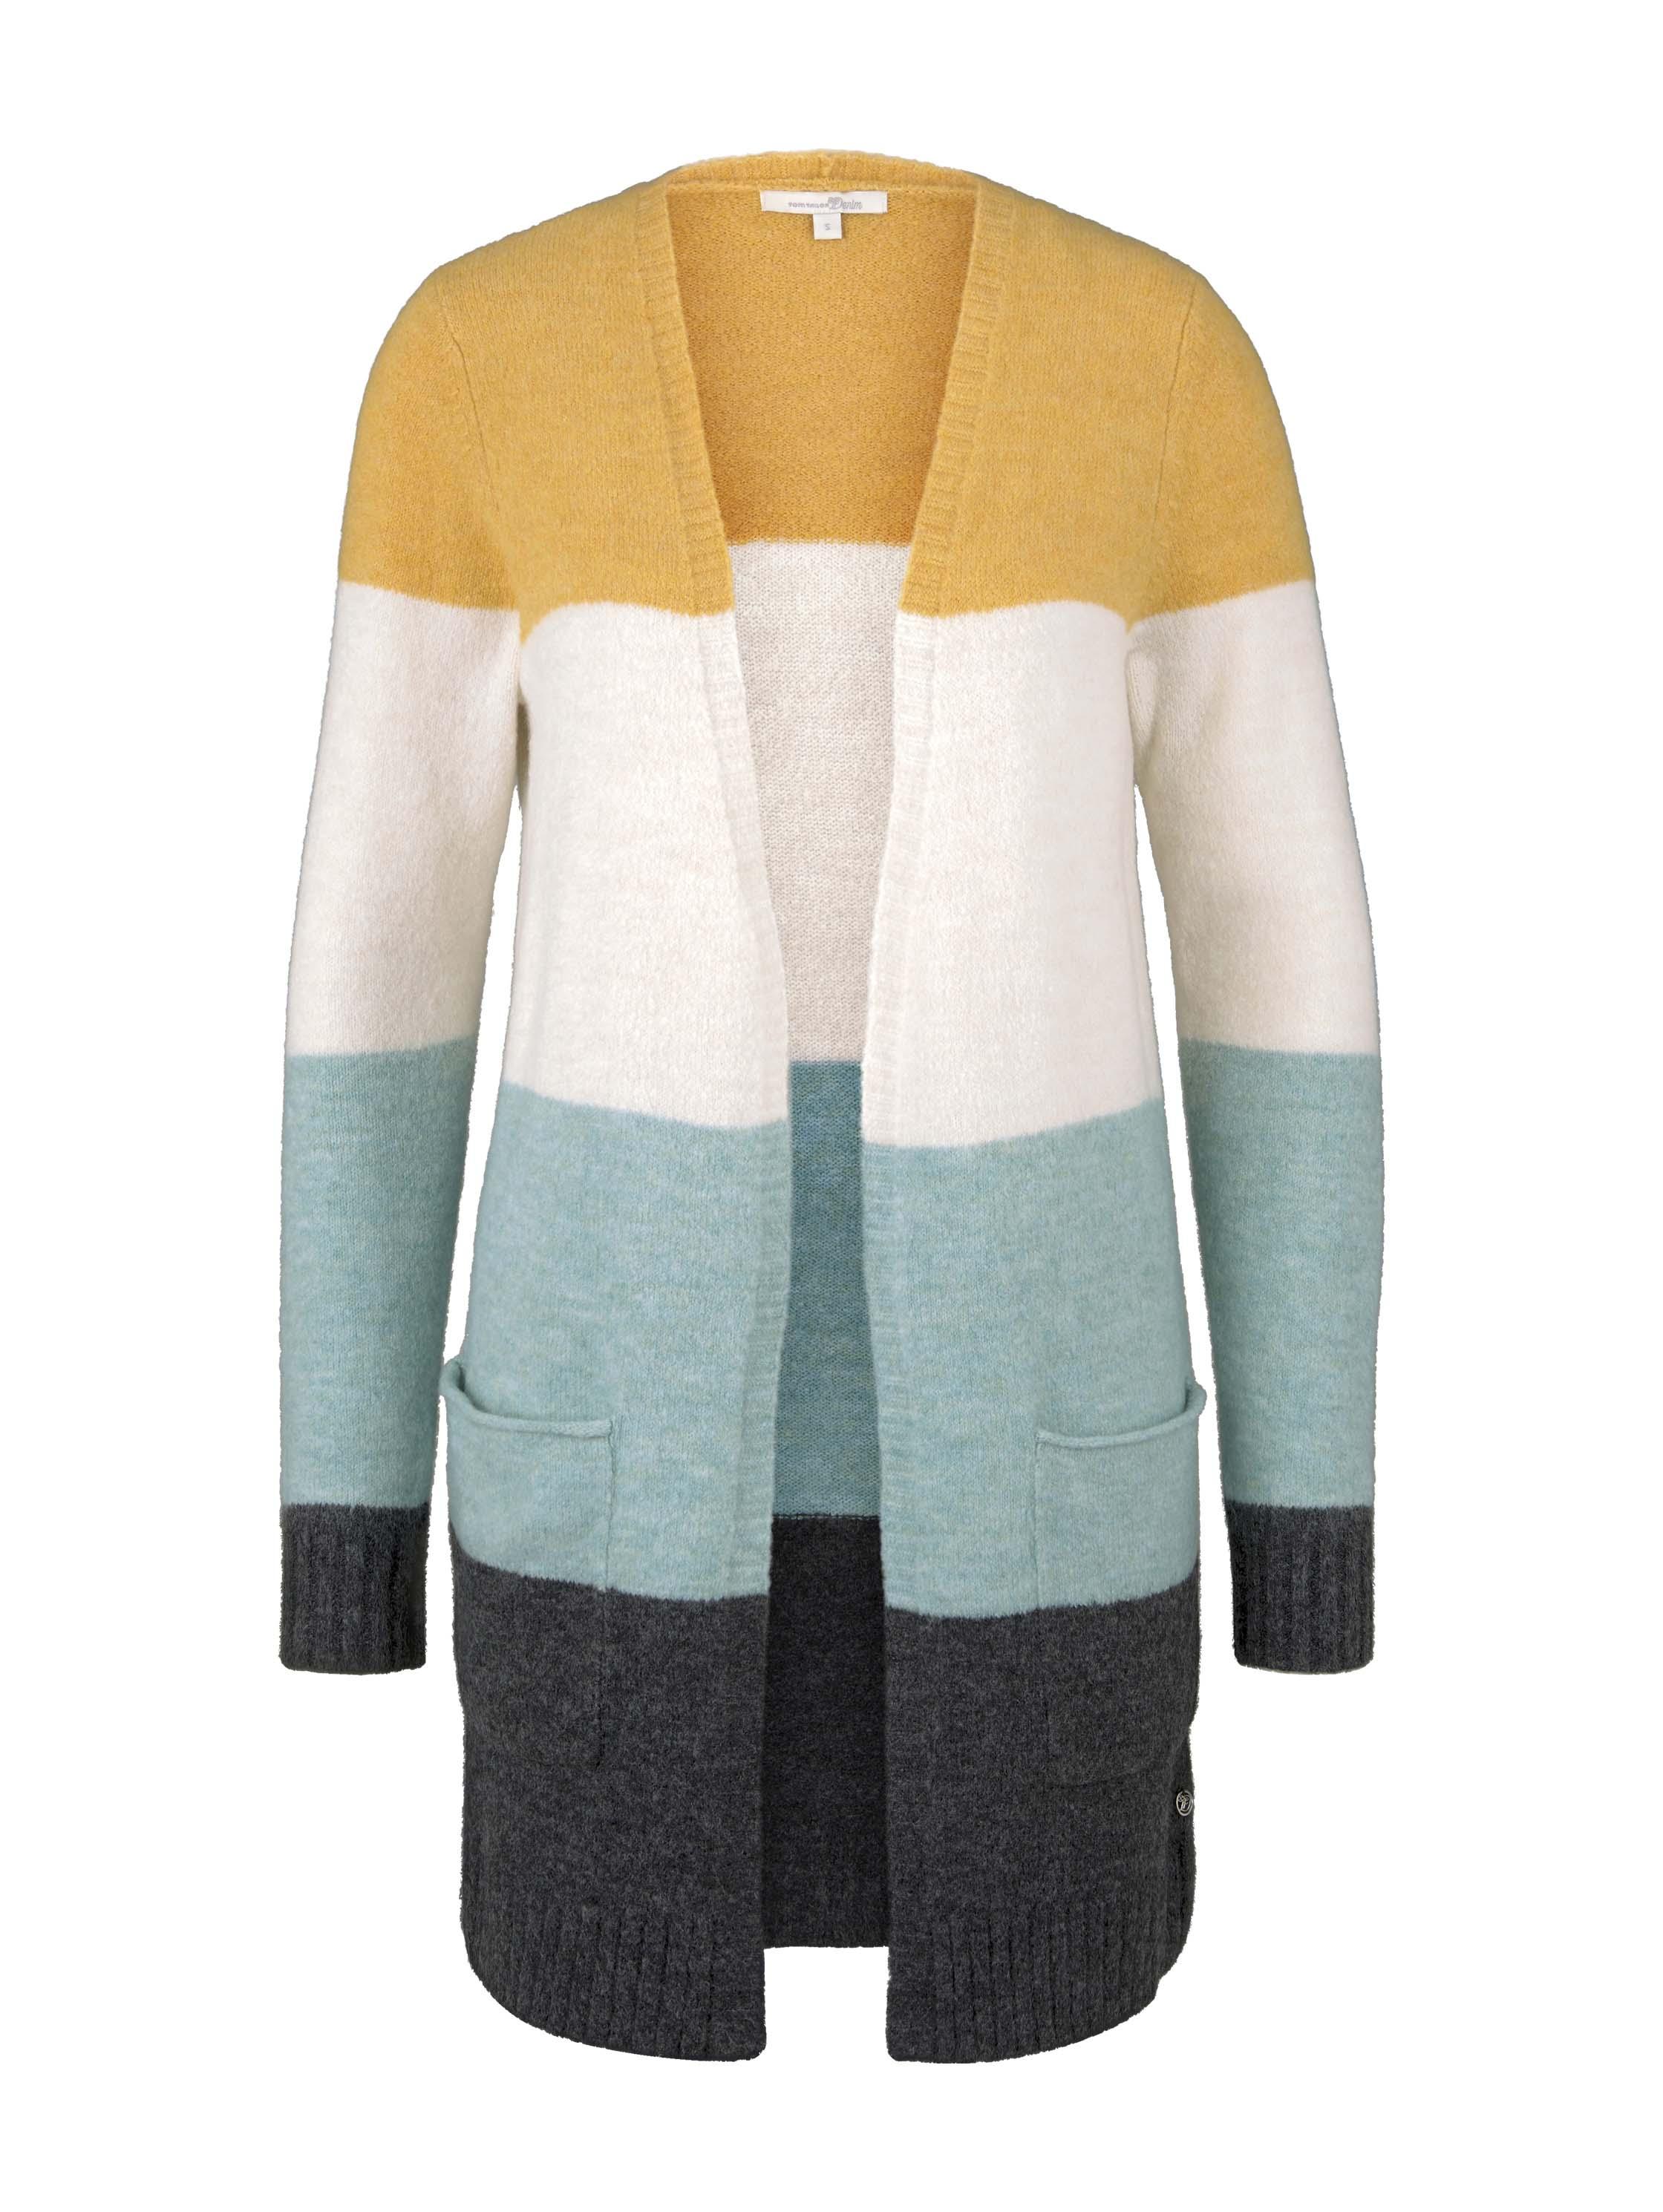 cosy striped basic cardigan, mint colourblock